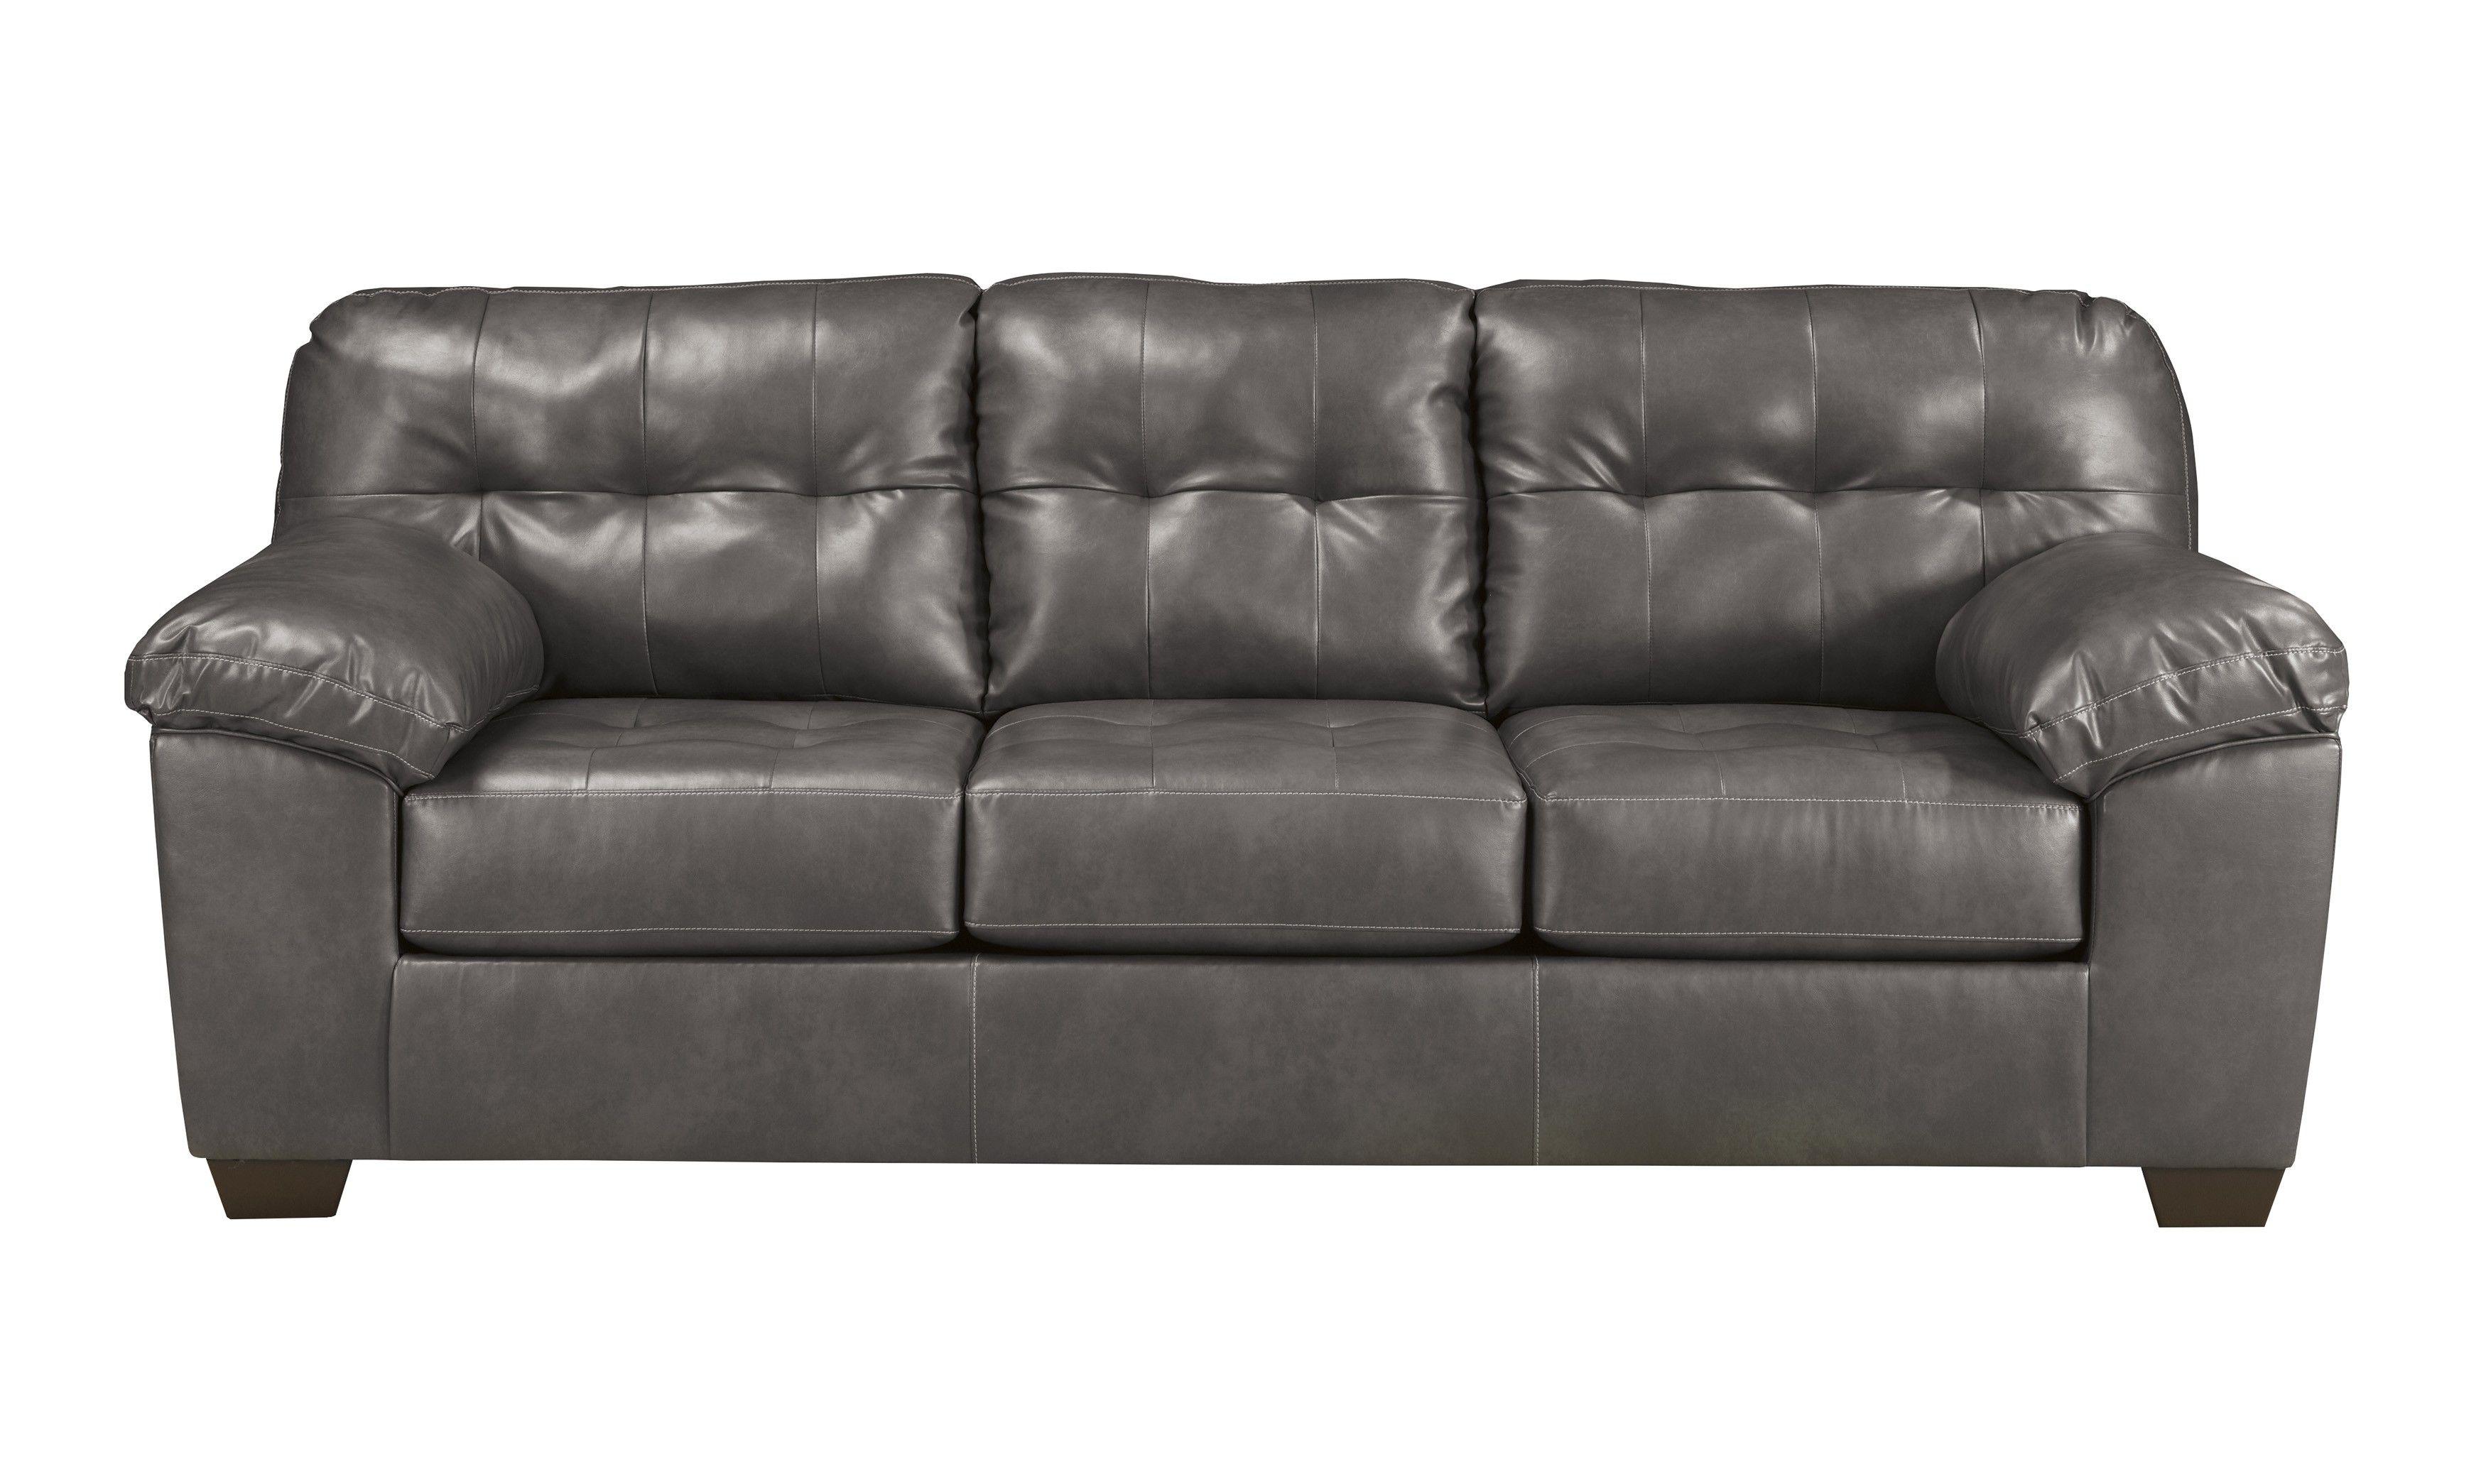 Alliston durablend gray queen sleeper sofa faux leather